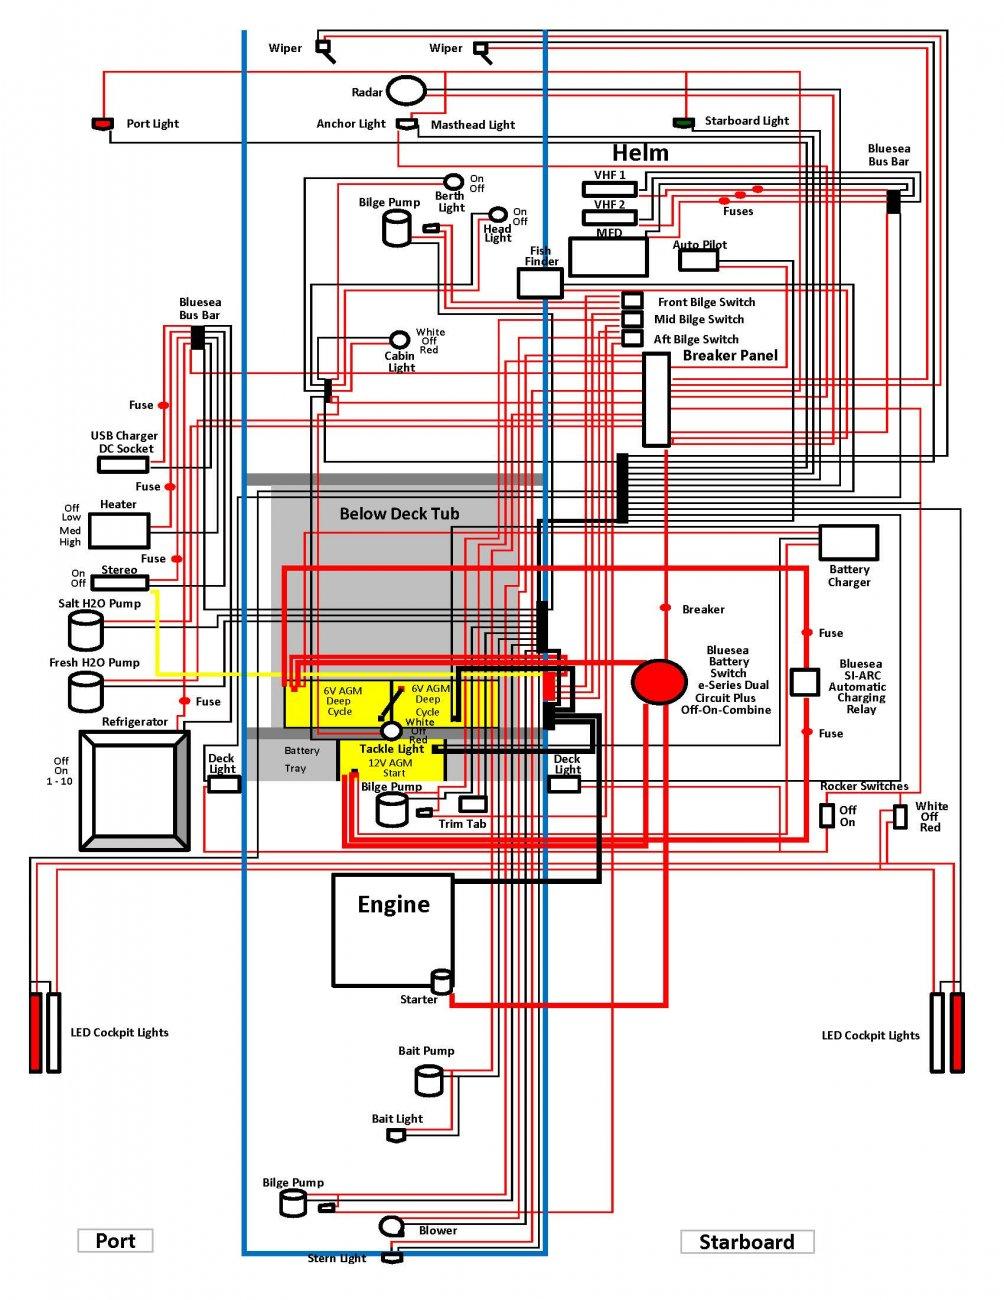 dc wiring diagram shamrock boat owners 39 club. Black Bedroom Furniture Sets. Home Design Ideas